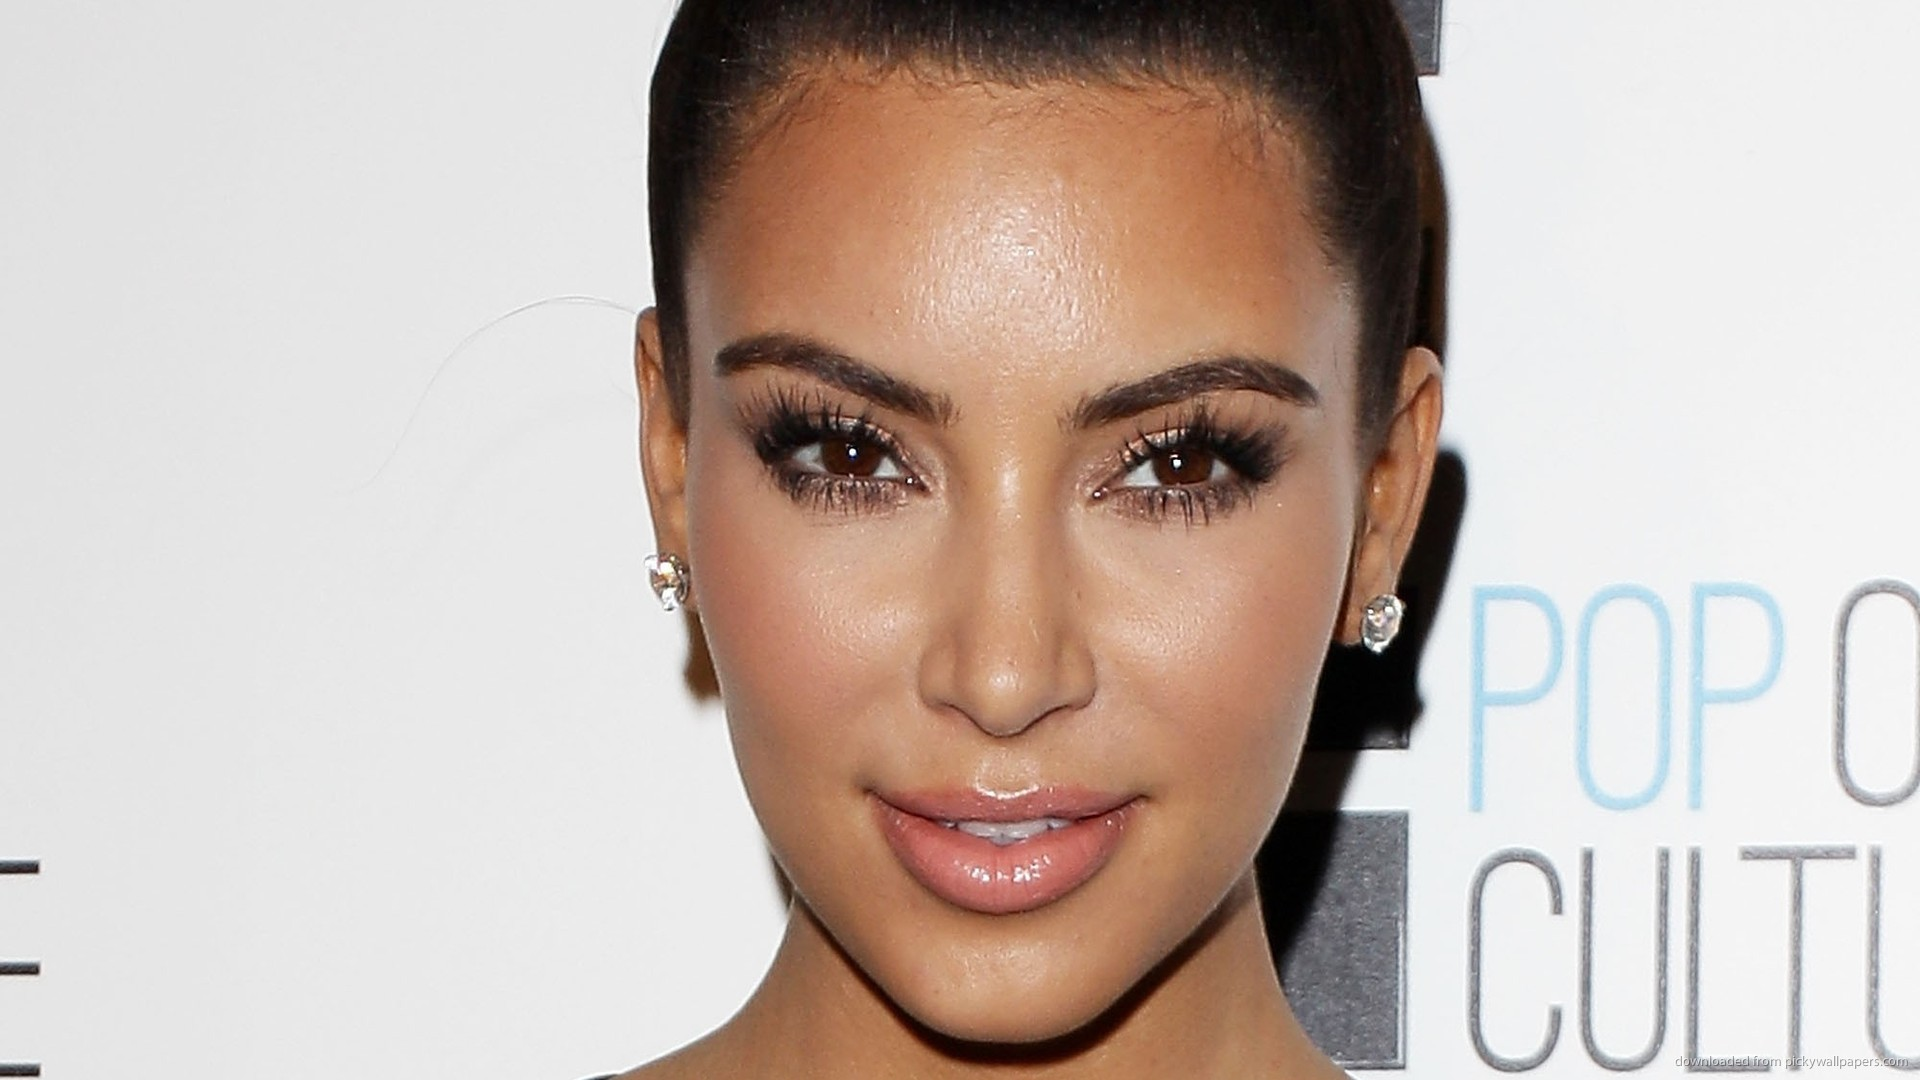 Kim Kardashian Knot Picture For iPhone Blackberry iPad Kim 1920x1080